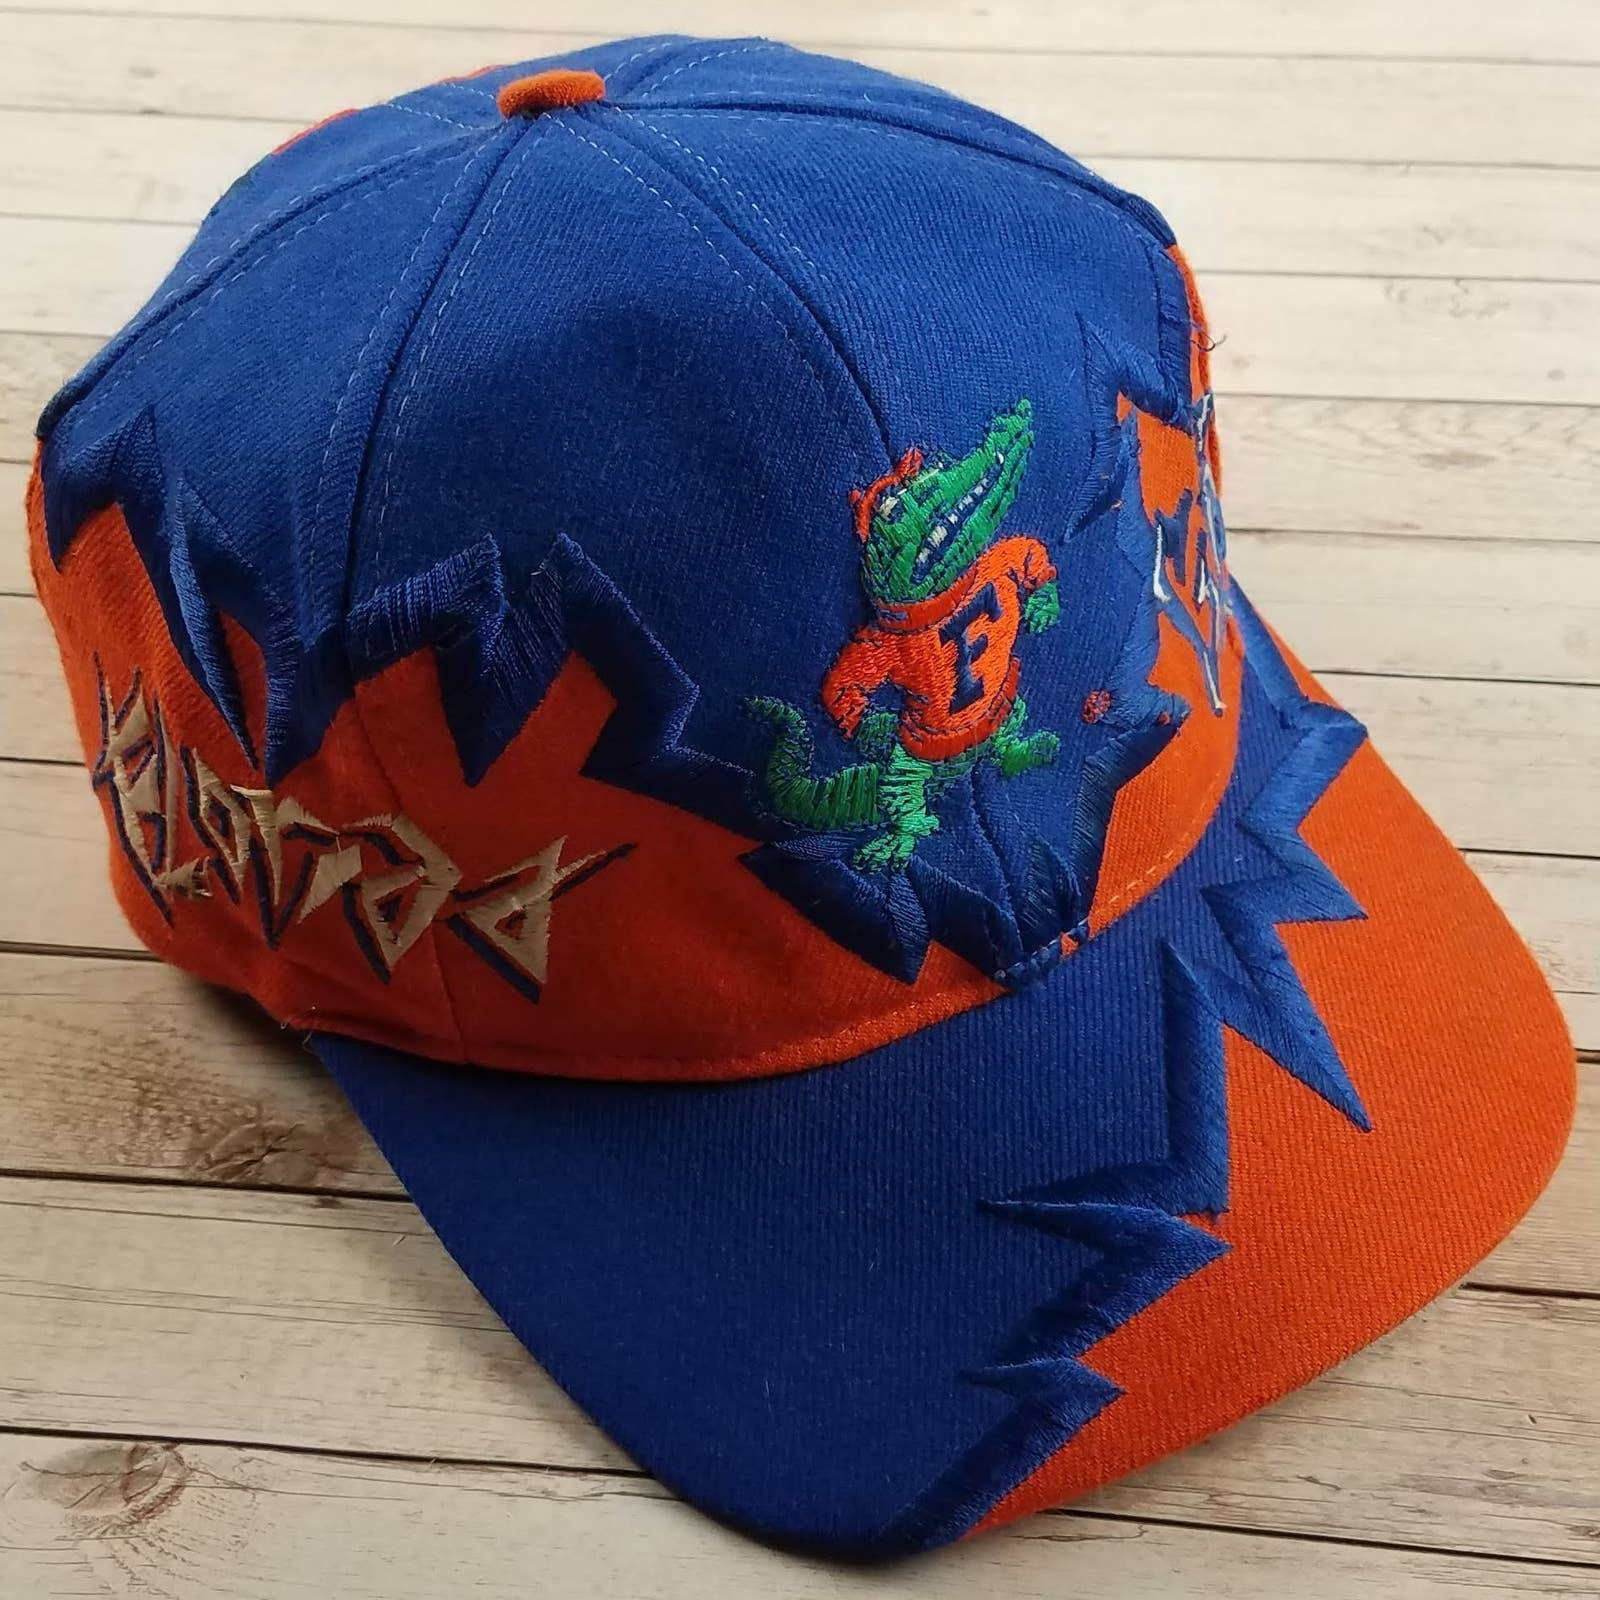 VTG 90s Florida Gator DP Jagged Edge Hat